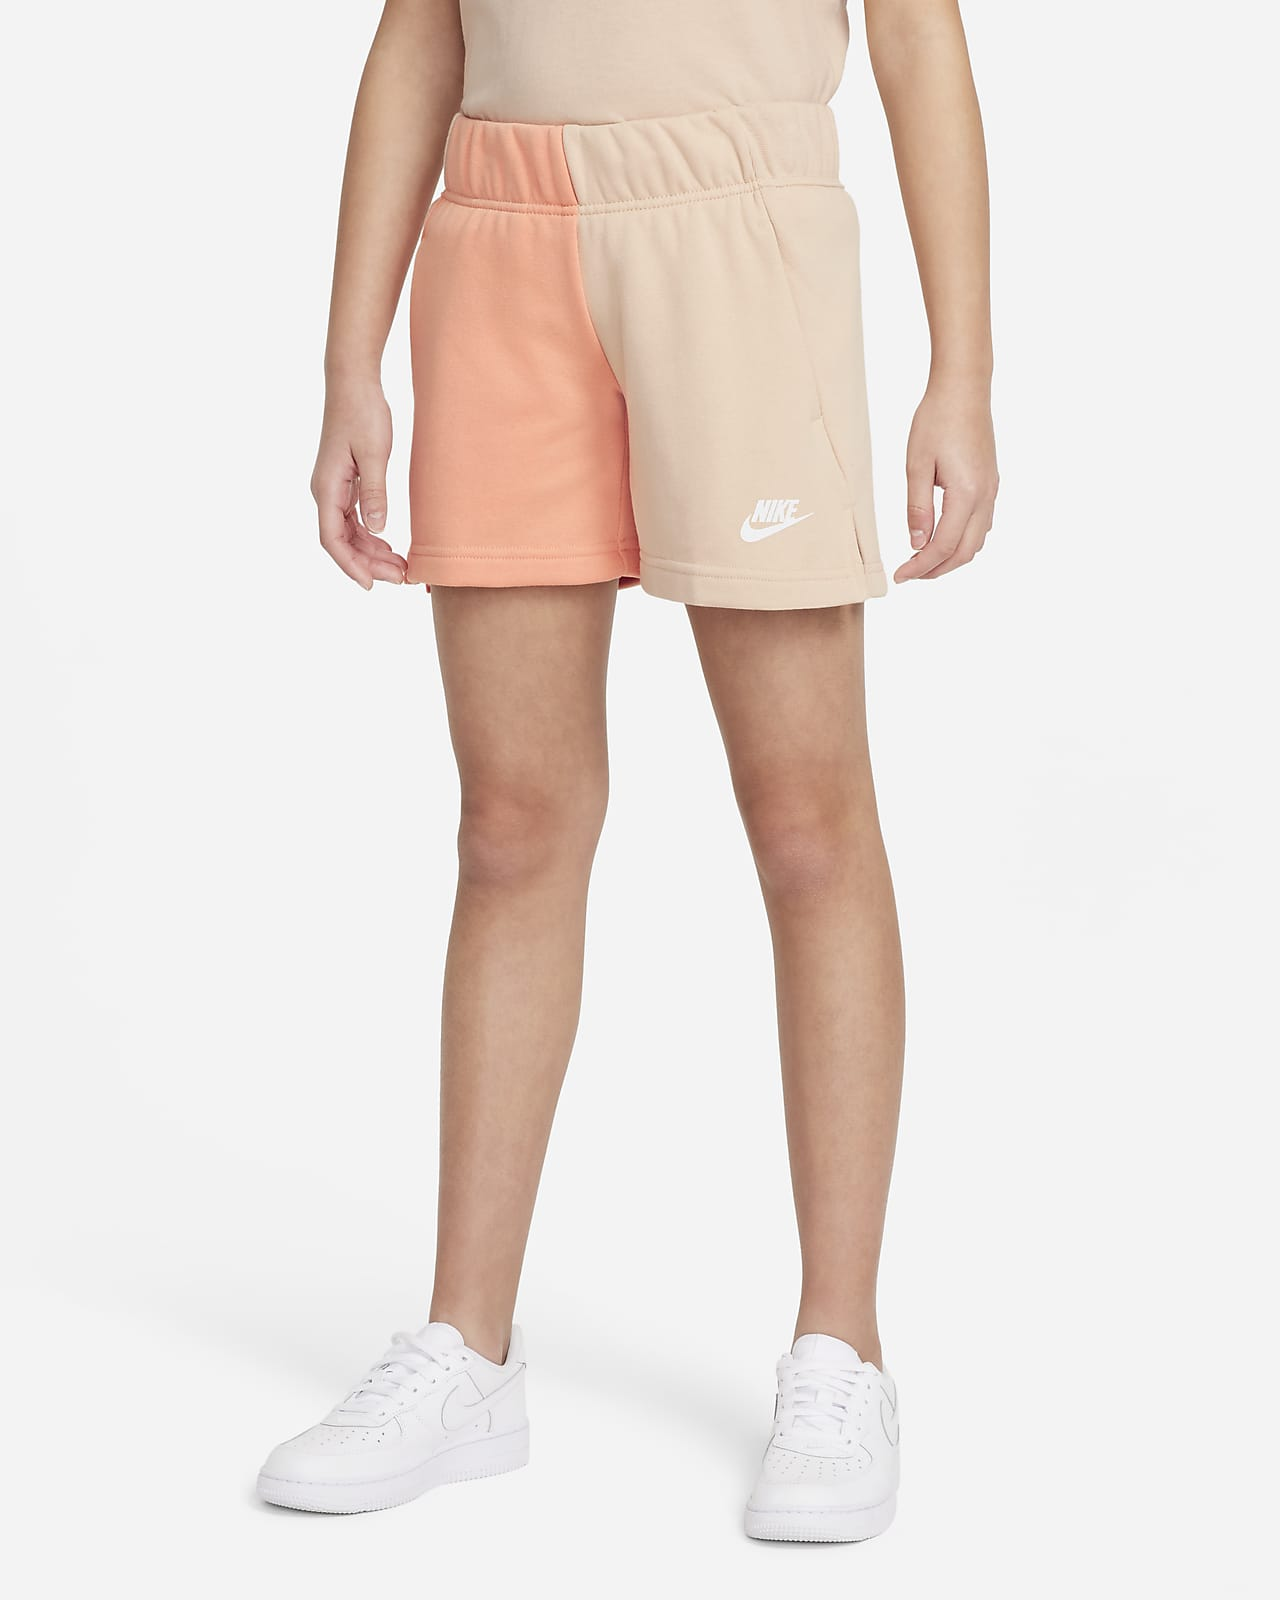 Shorts in French Terry Nike Sportswear - Ragazza